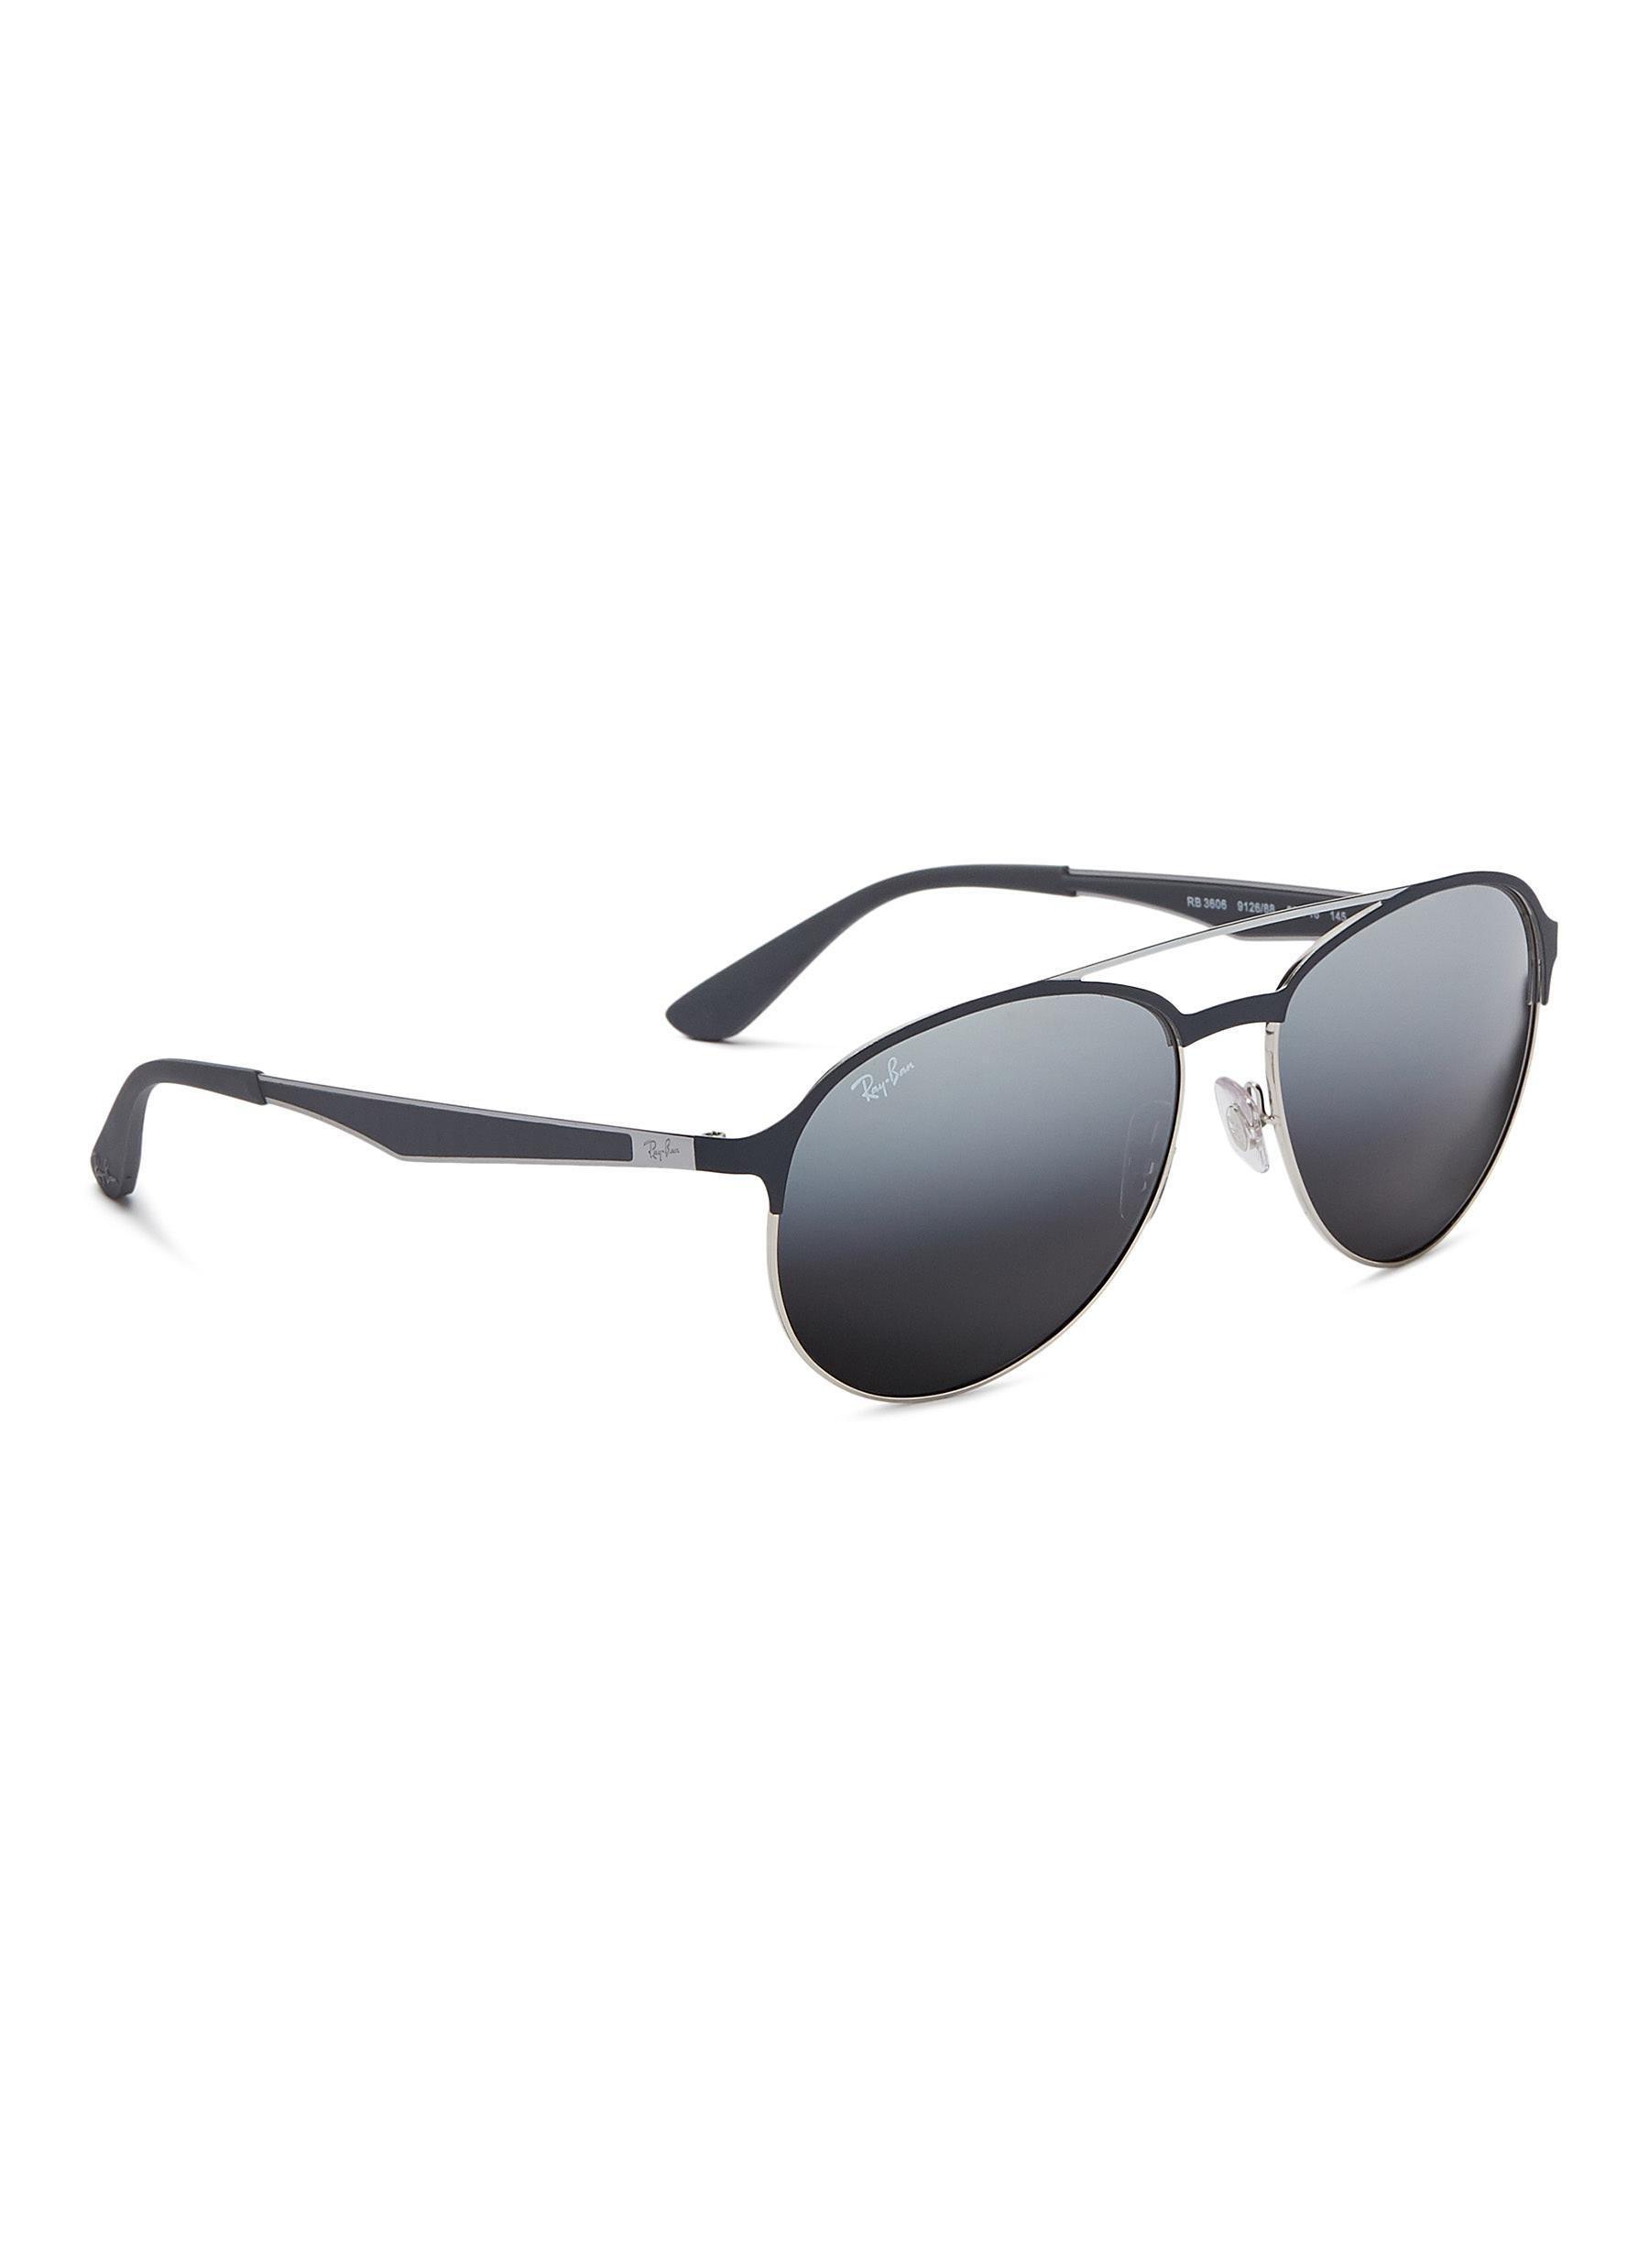 e1154a37e ... green aviator sunglasses rb3025 0025 55 14 8a232 84e63; best price ray  ban gray rb3606 mirror metal aviator sunglasses for men lyst. view  fullscreen